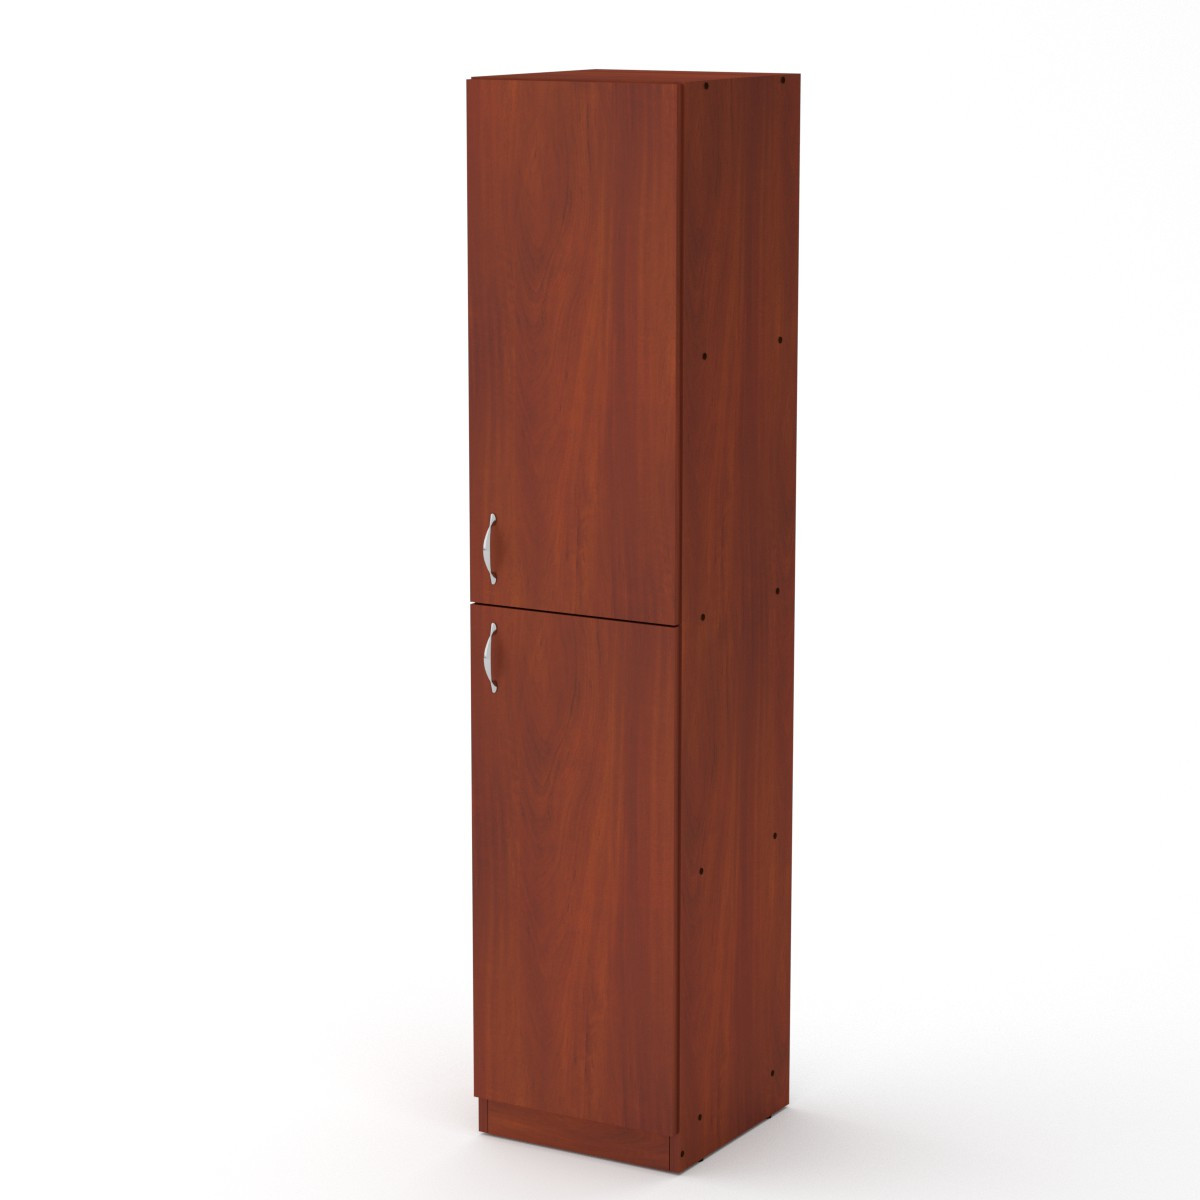 Шкаф книжный КШ-13 яблоня Компанит (35х37х159 см)